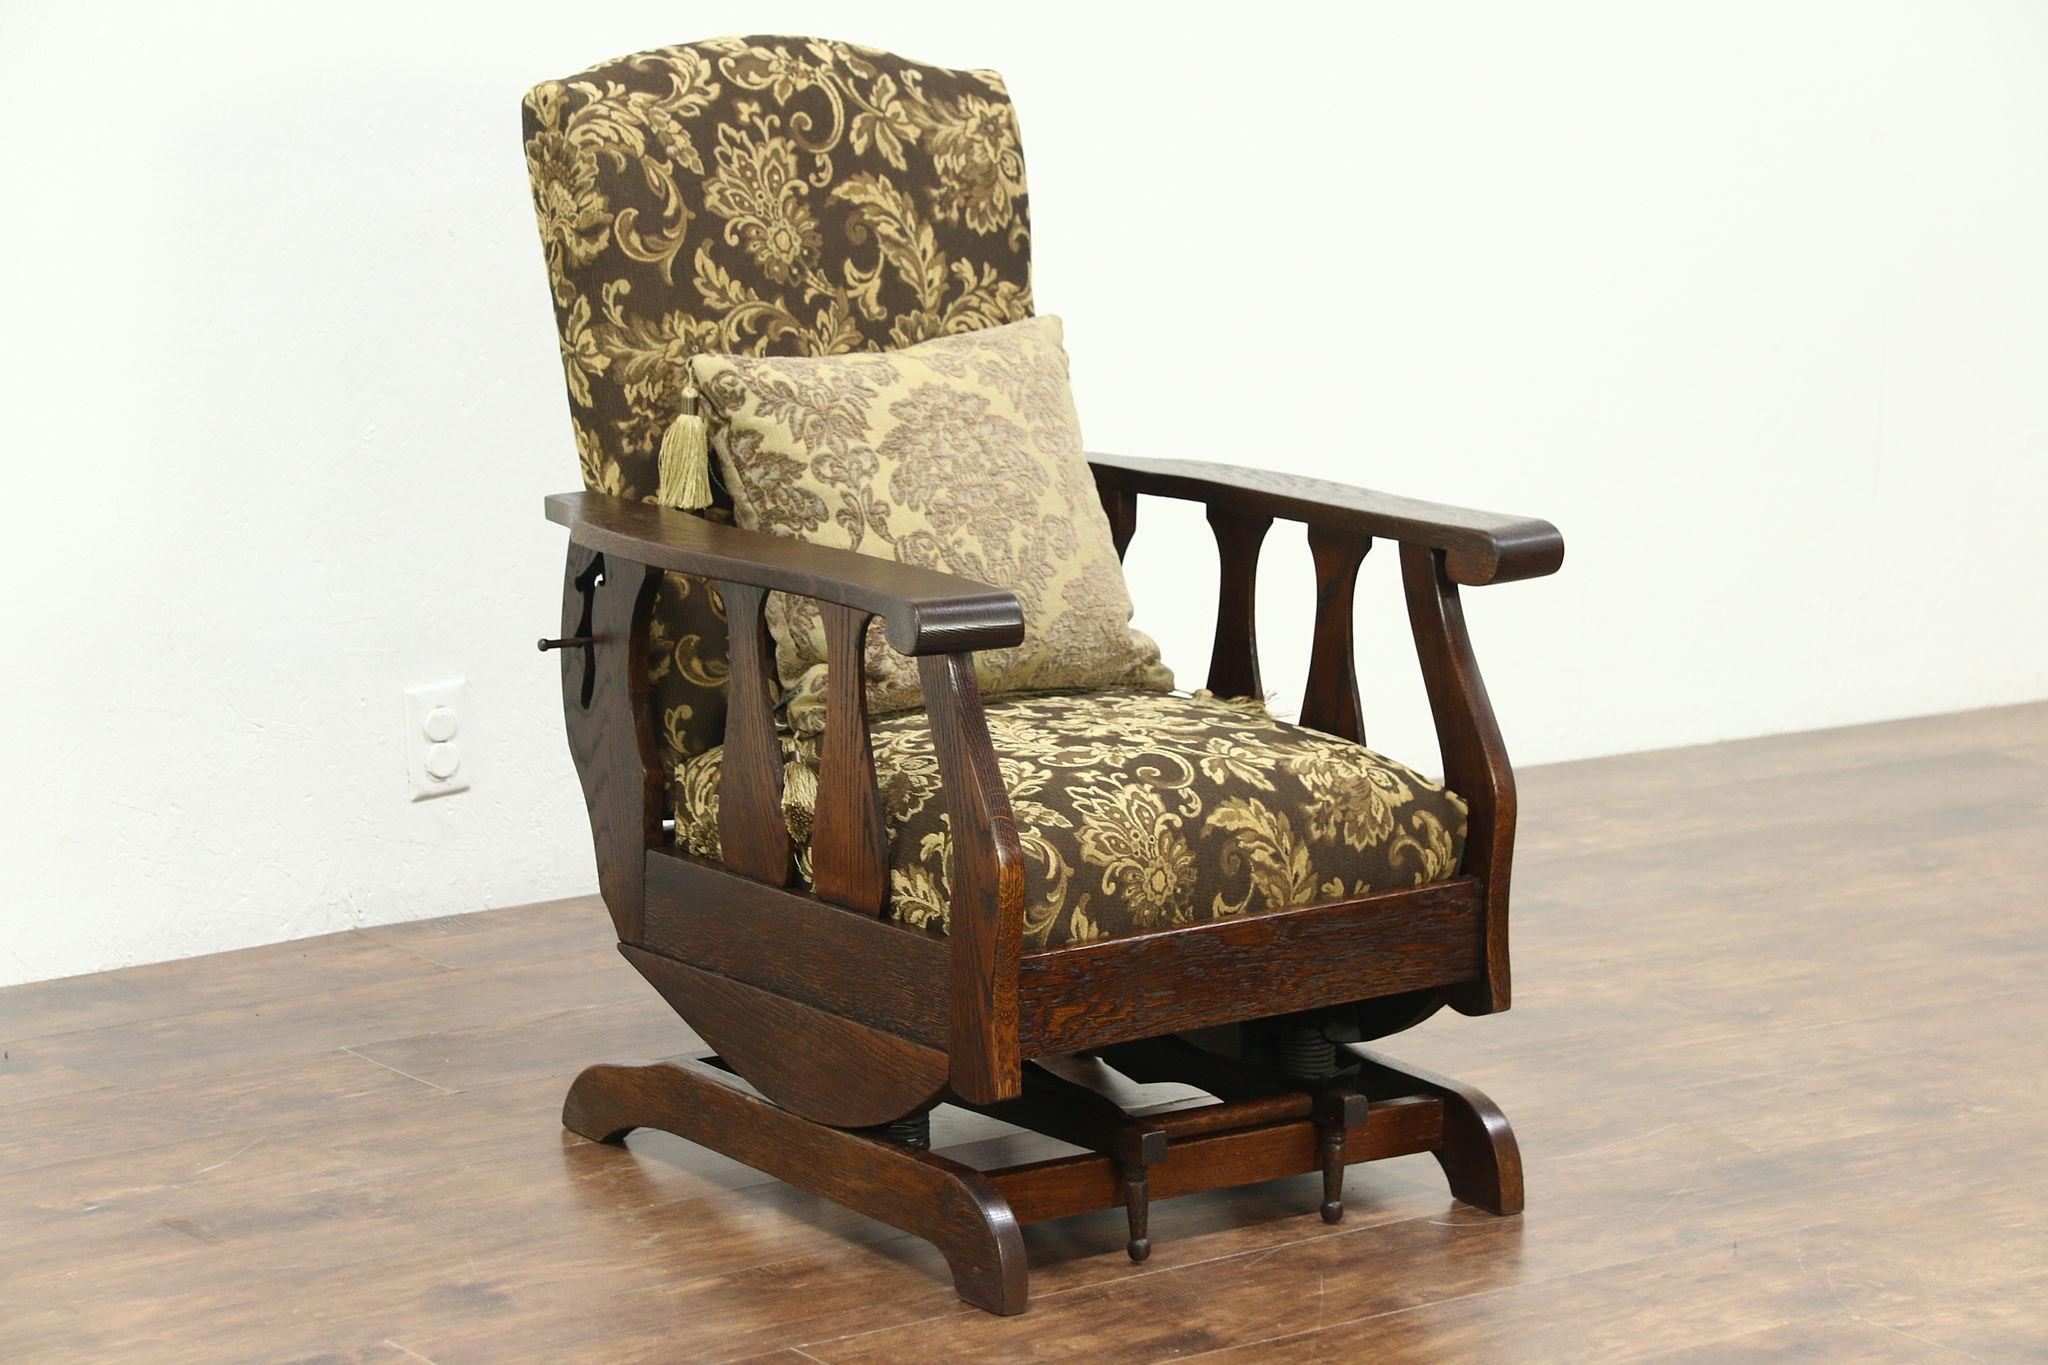 Pleasing Oak Antique Morris Chair Recliner Platform Rocker Footstool New Upholstery Inzonedesignstudio Interior Chair Design Inzonedesignstudiocom